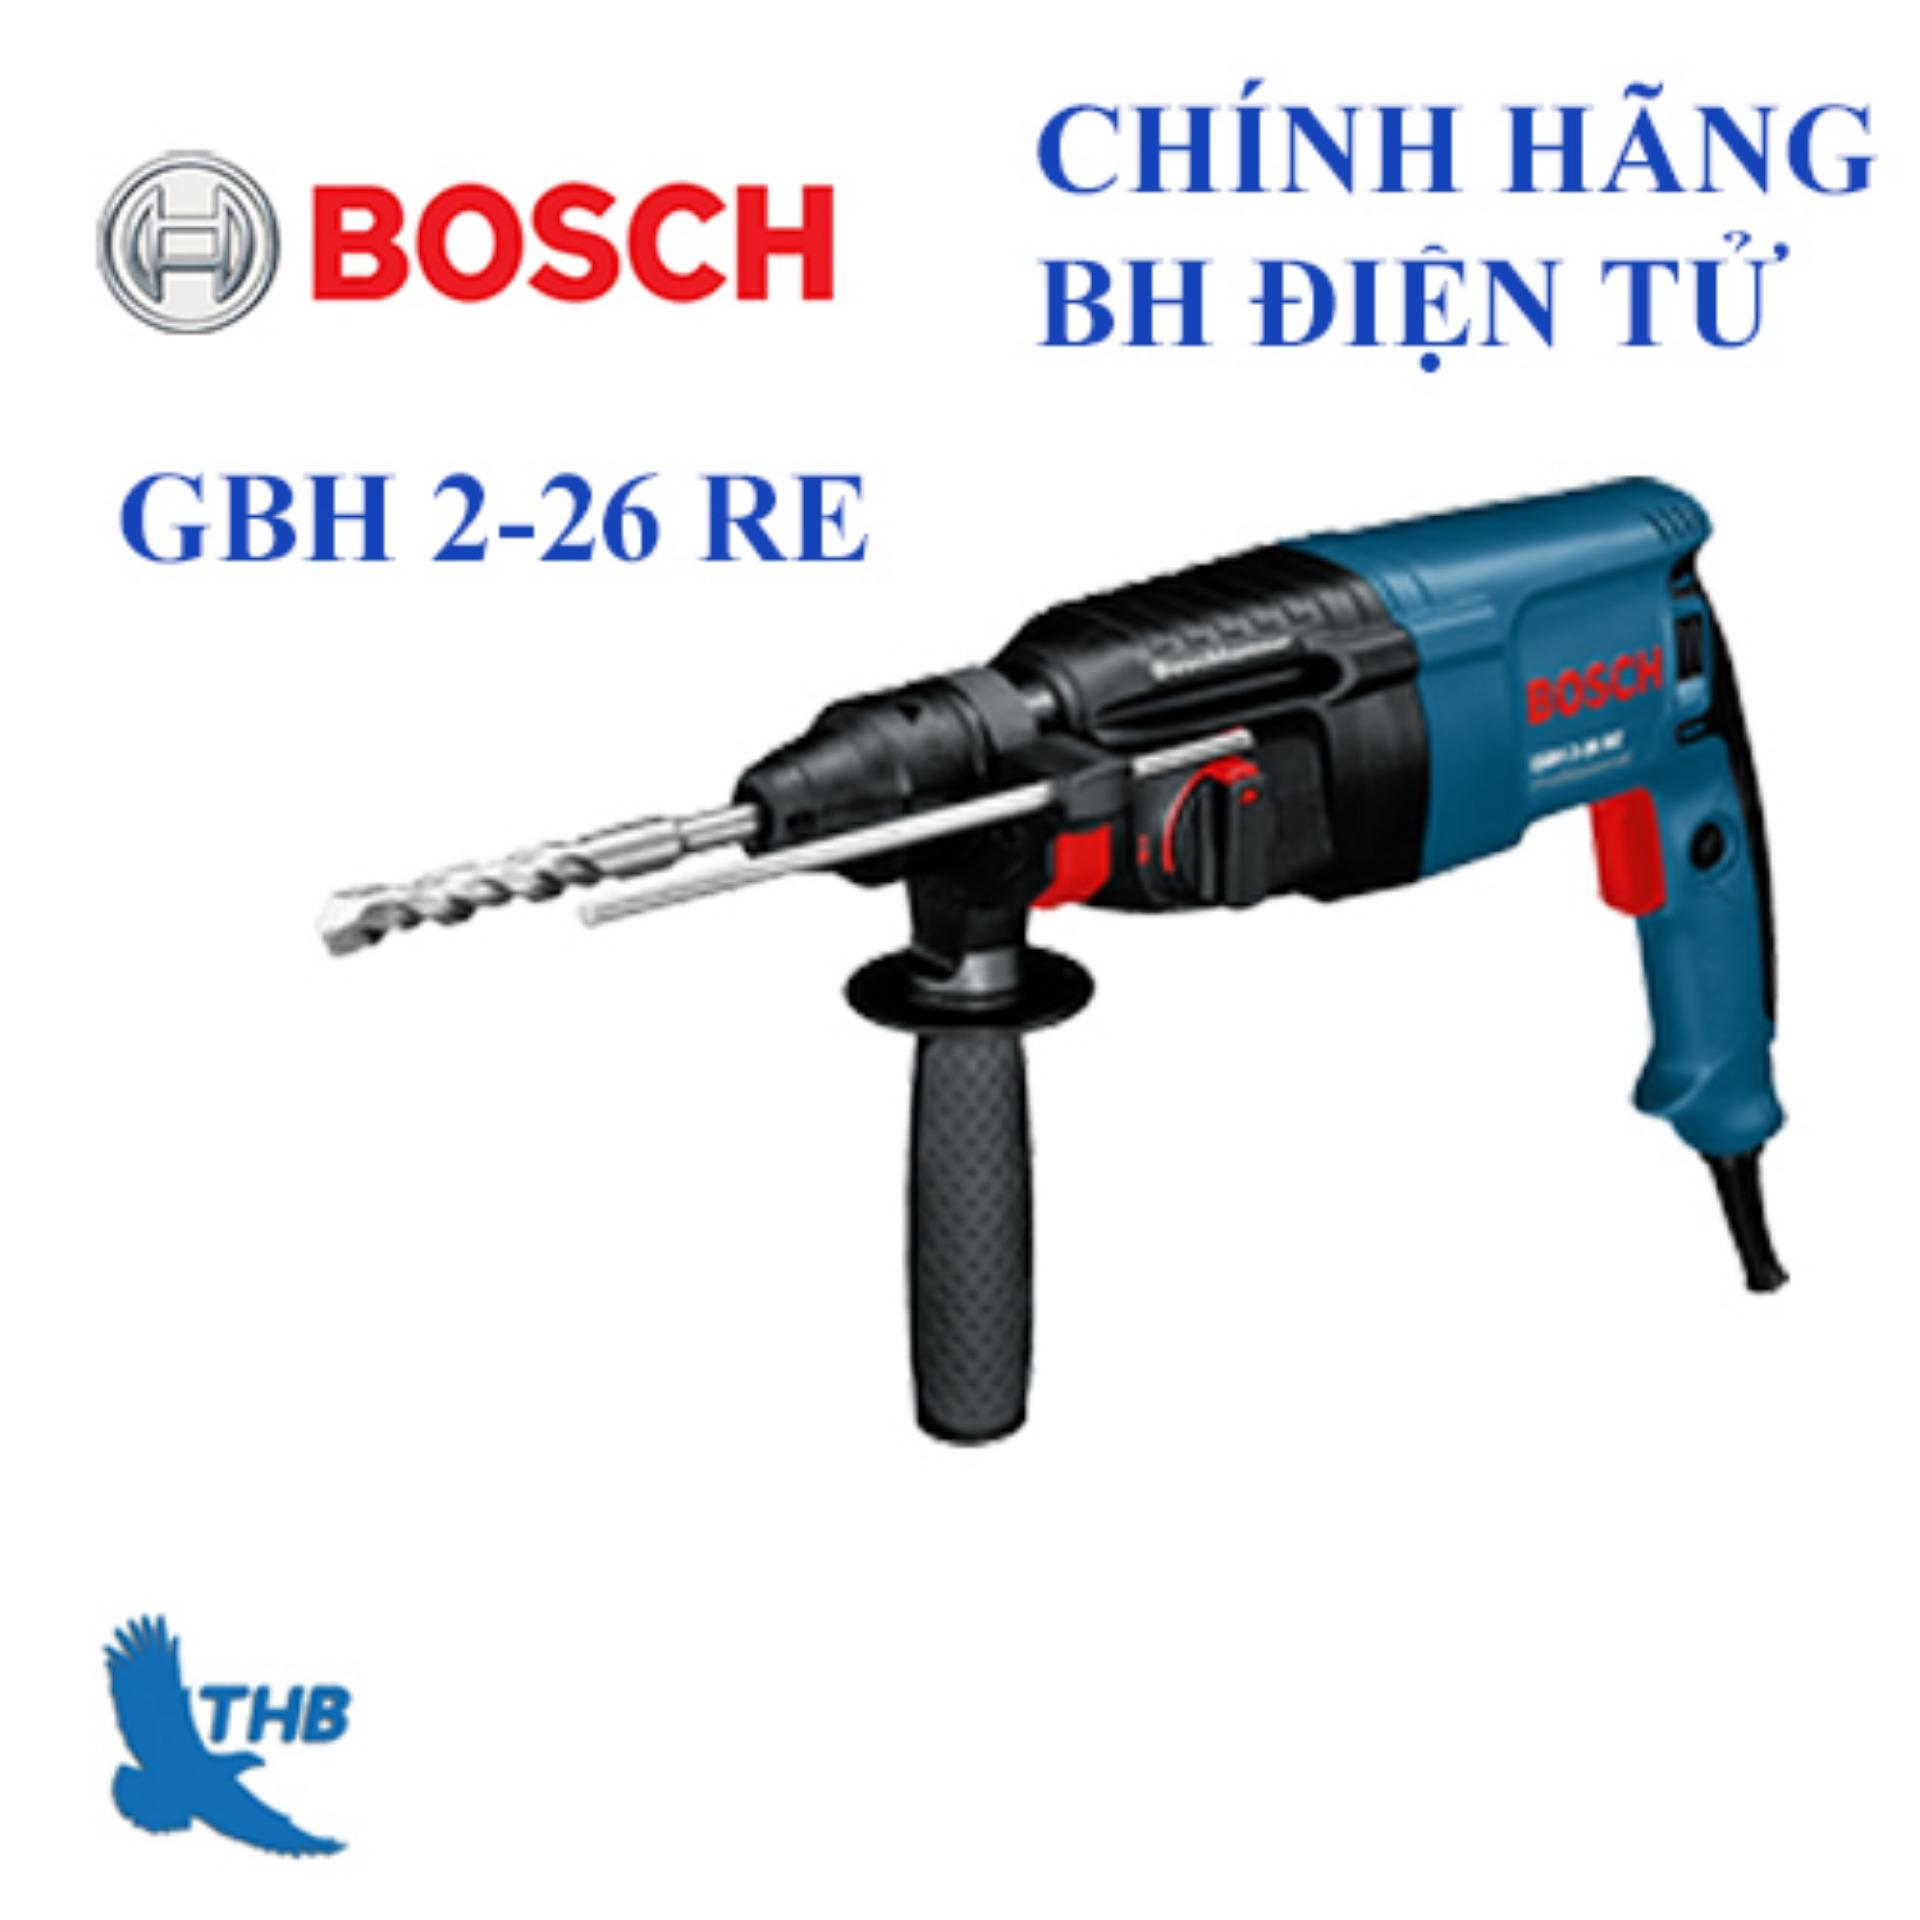 Máy khoan búa Bosch GBH 2-26 RE